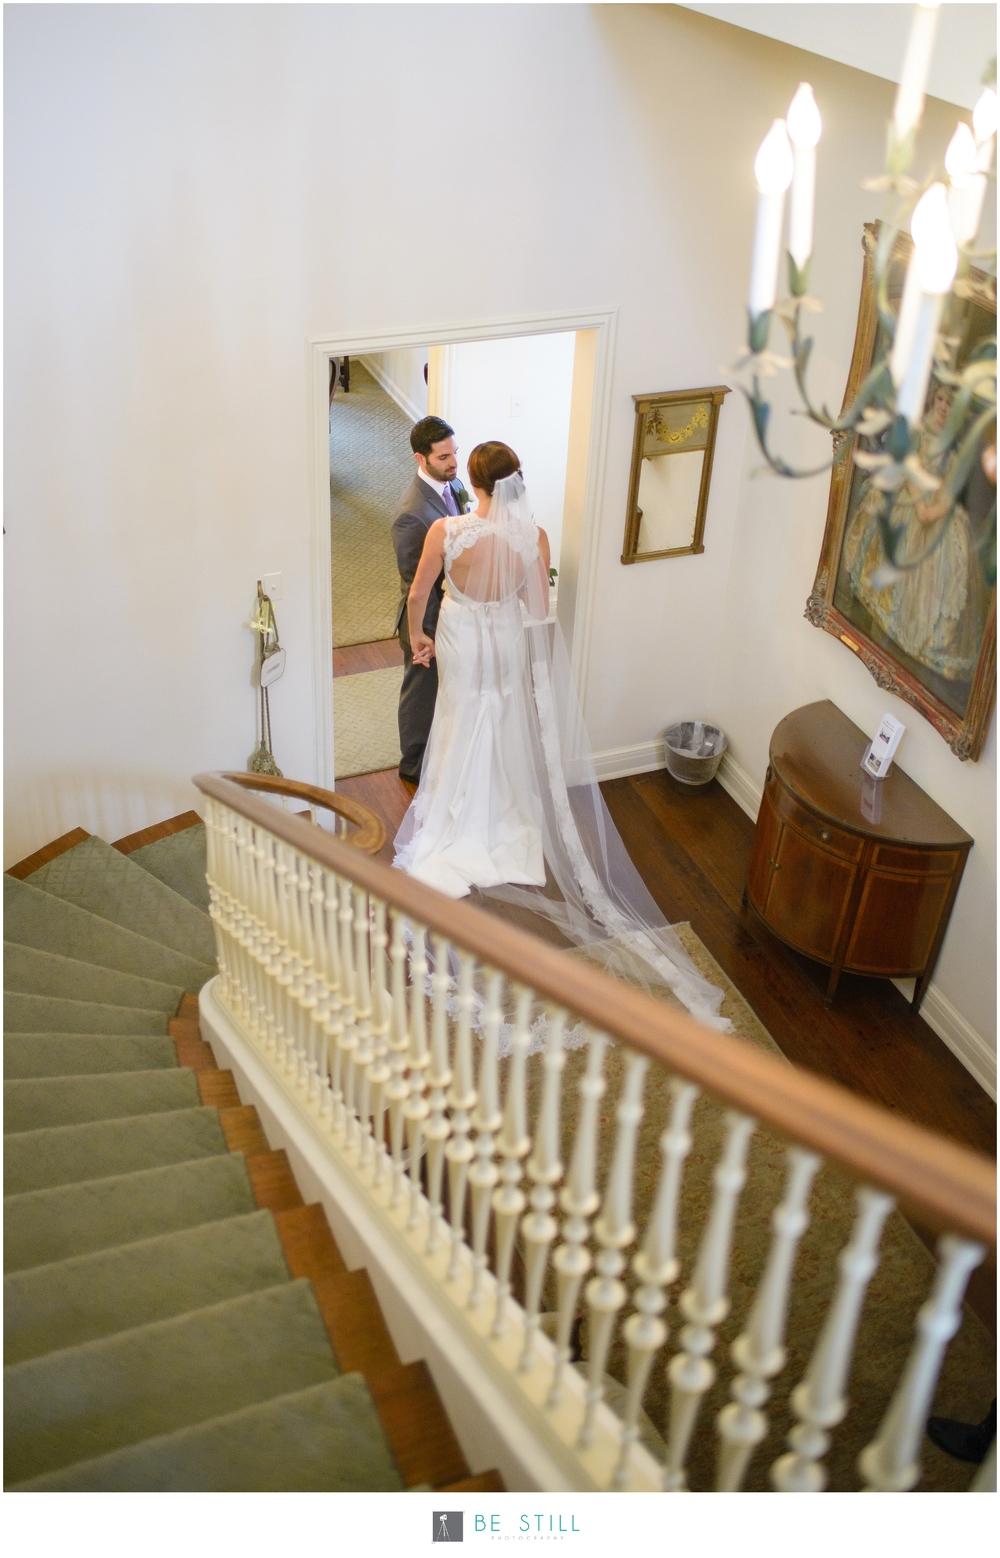 Be Still Photog San Diego Wedding Photographer_0221